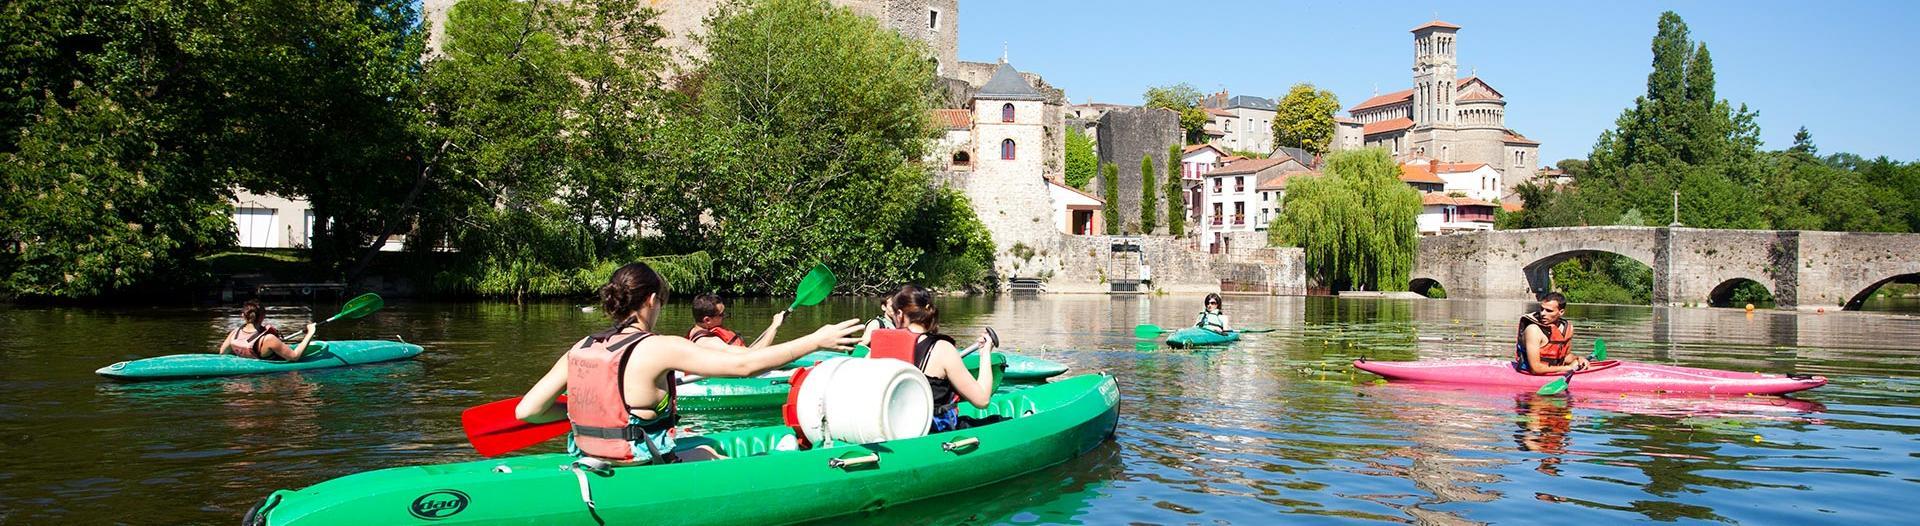 slider-campagne-canoe-clisson